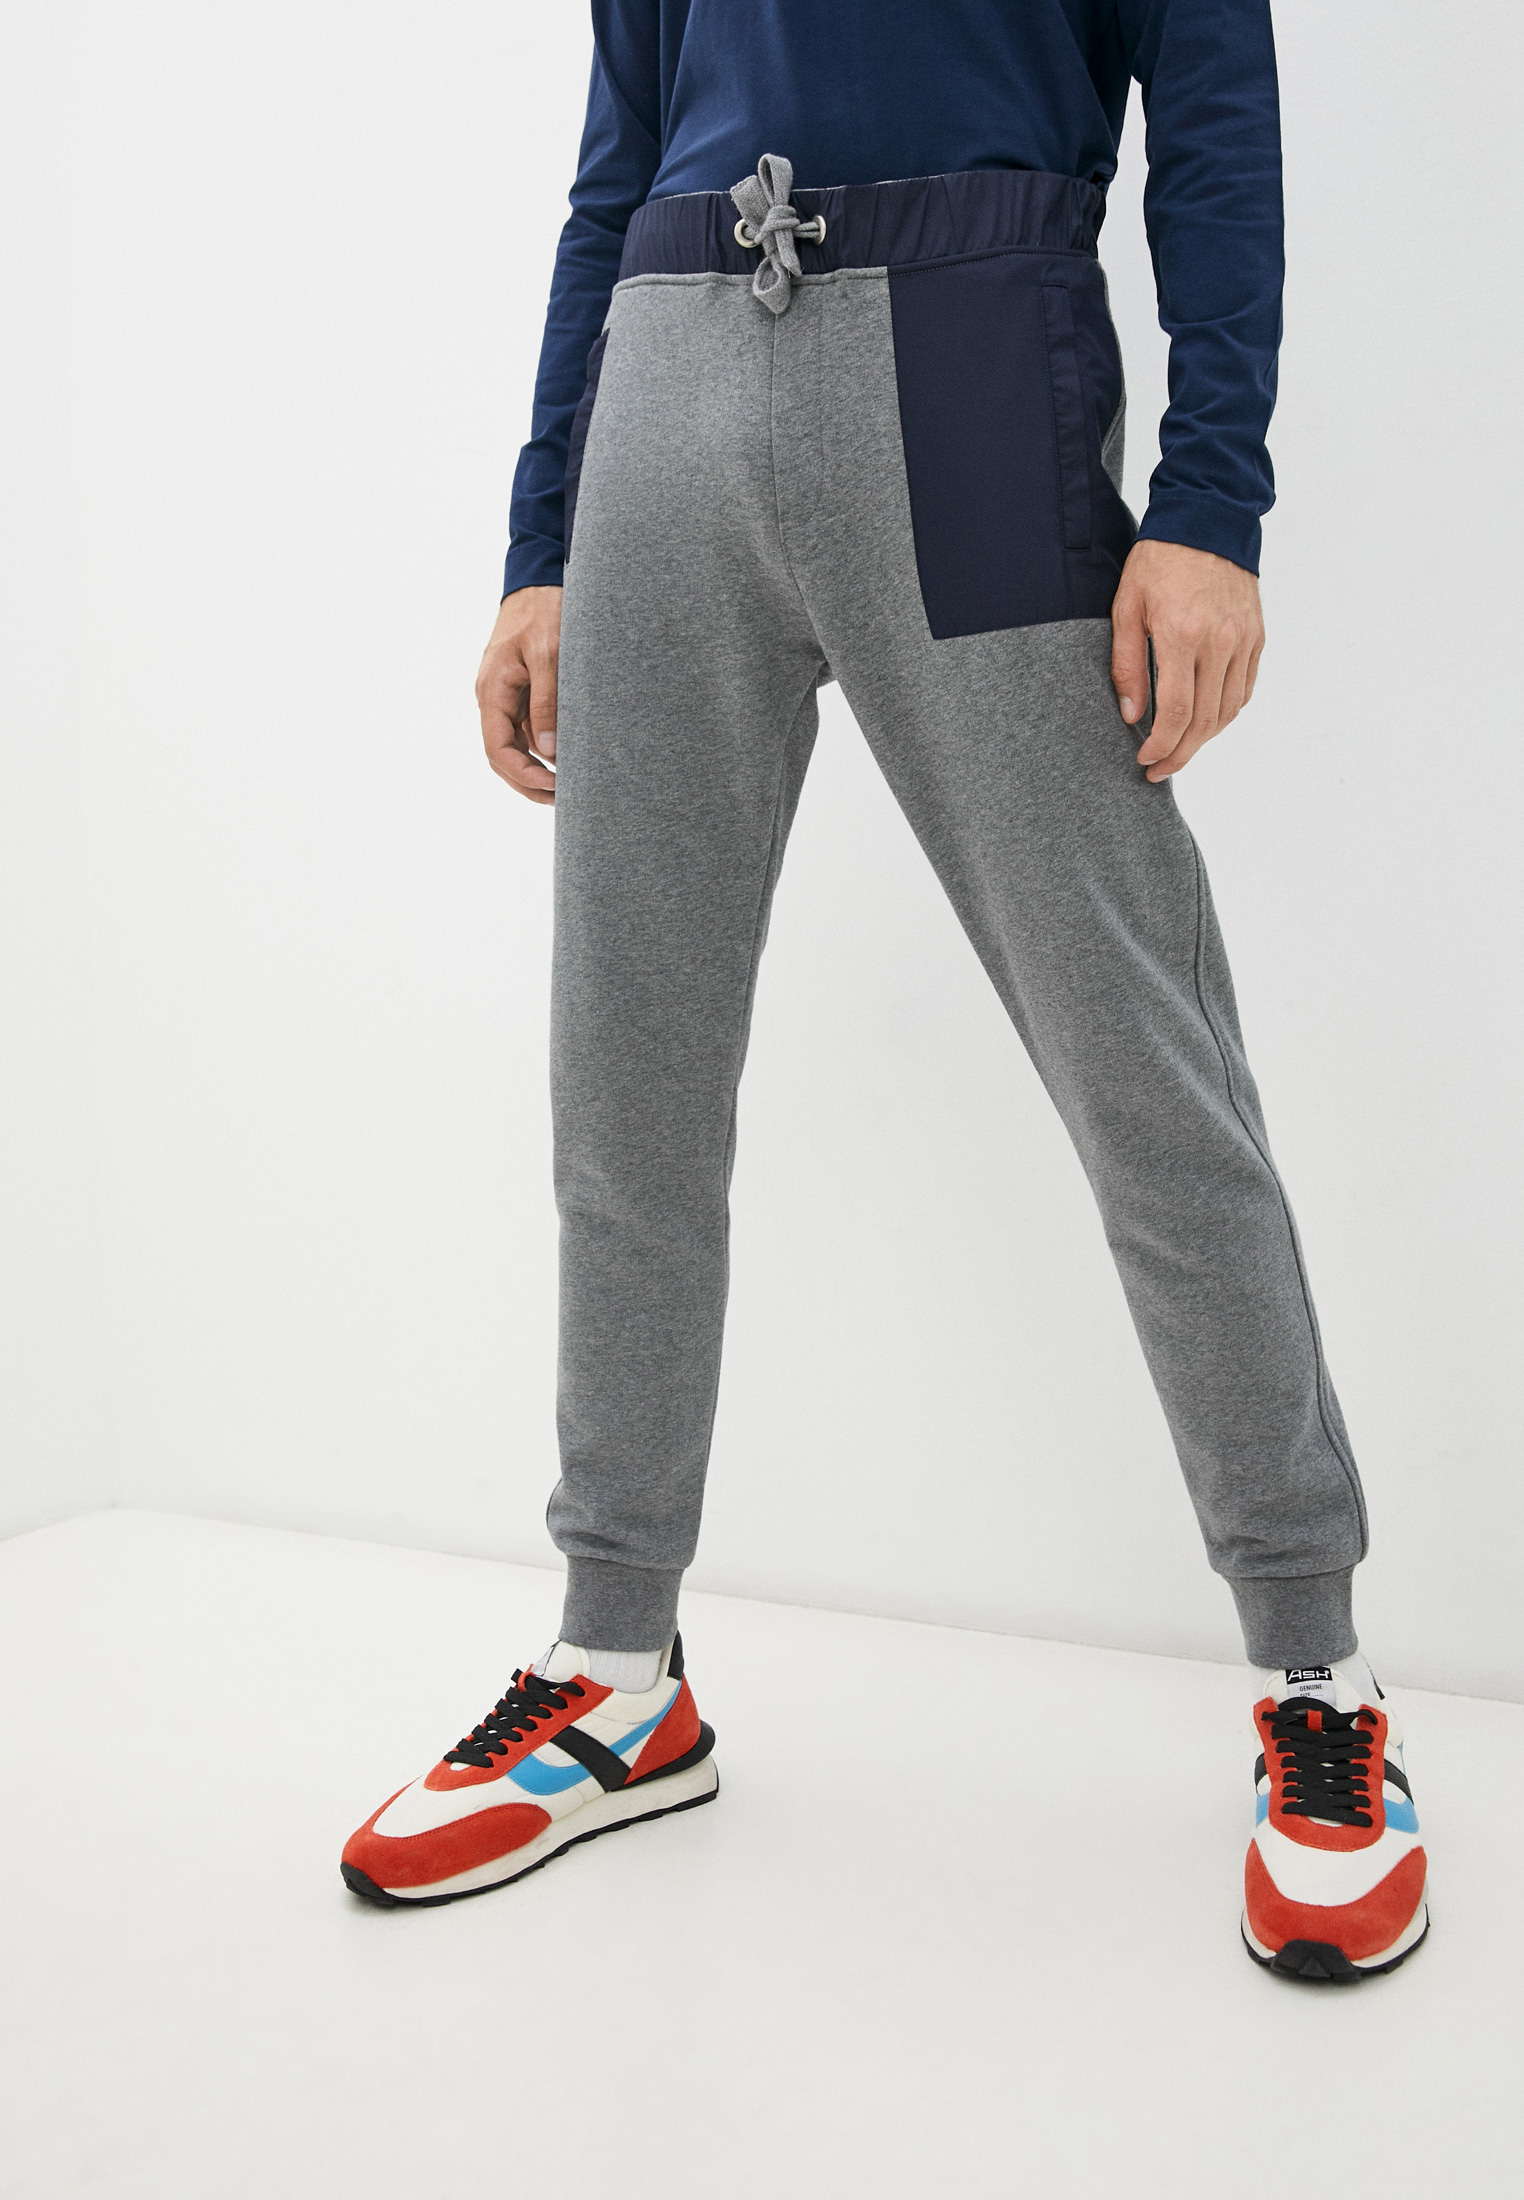 Мужские спортивные брюки Bikkembergs (Биккембергс) C 1 013 80 M 3806